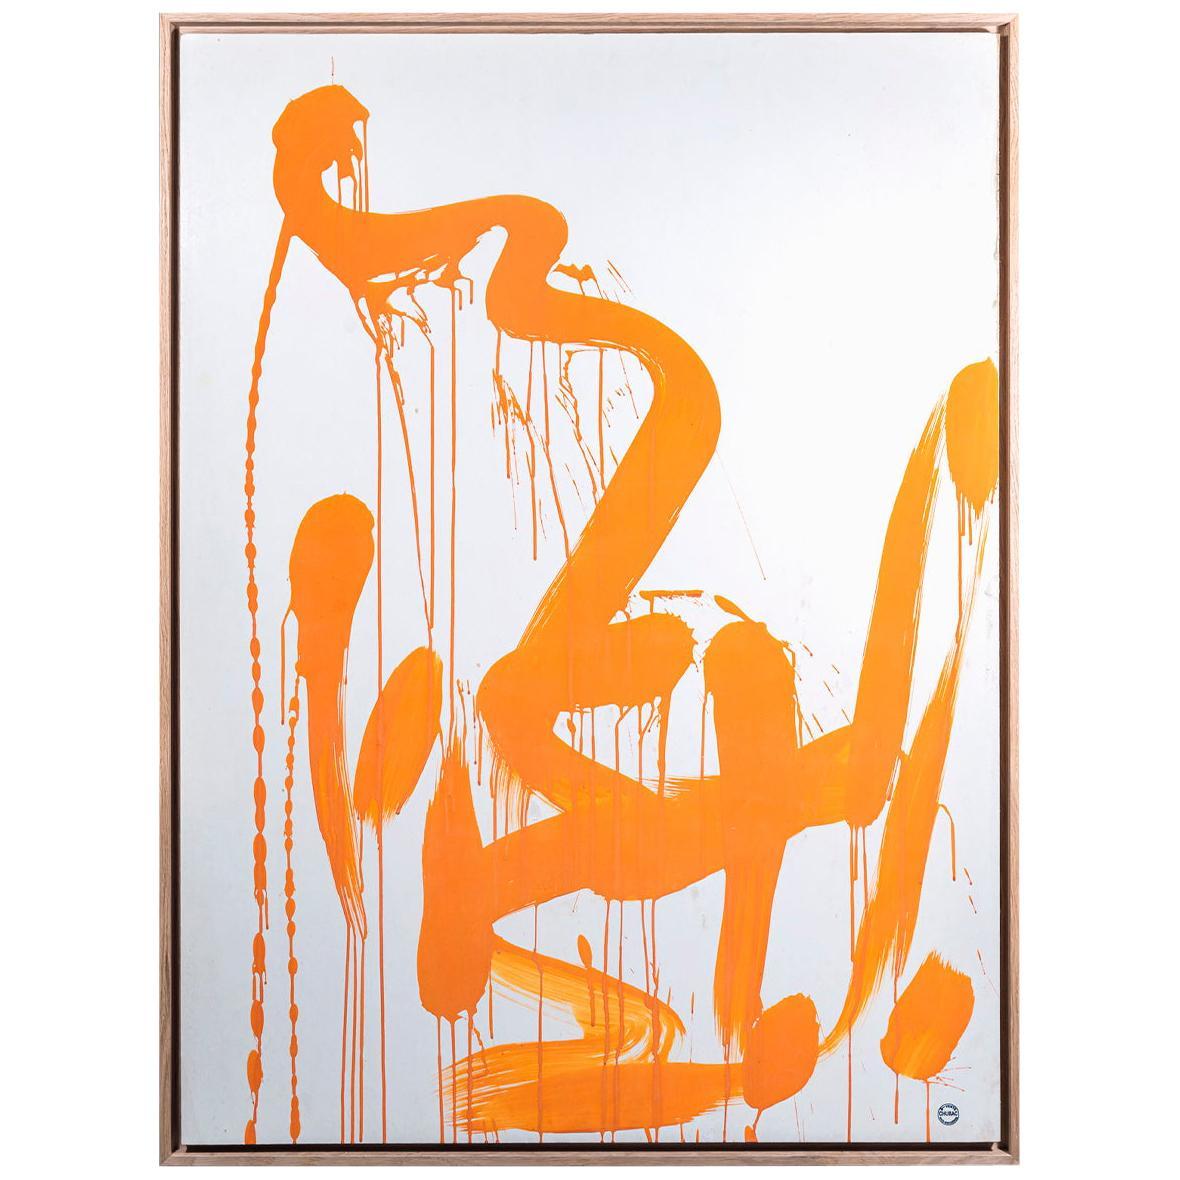 Albert Chubac, Abstract composition, Painting, circa 1960, France